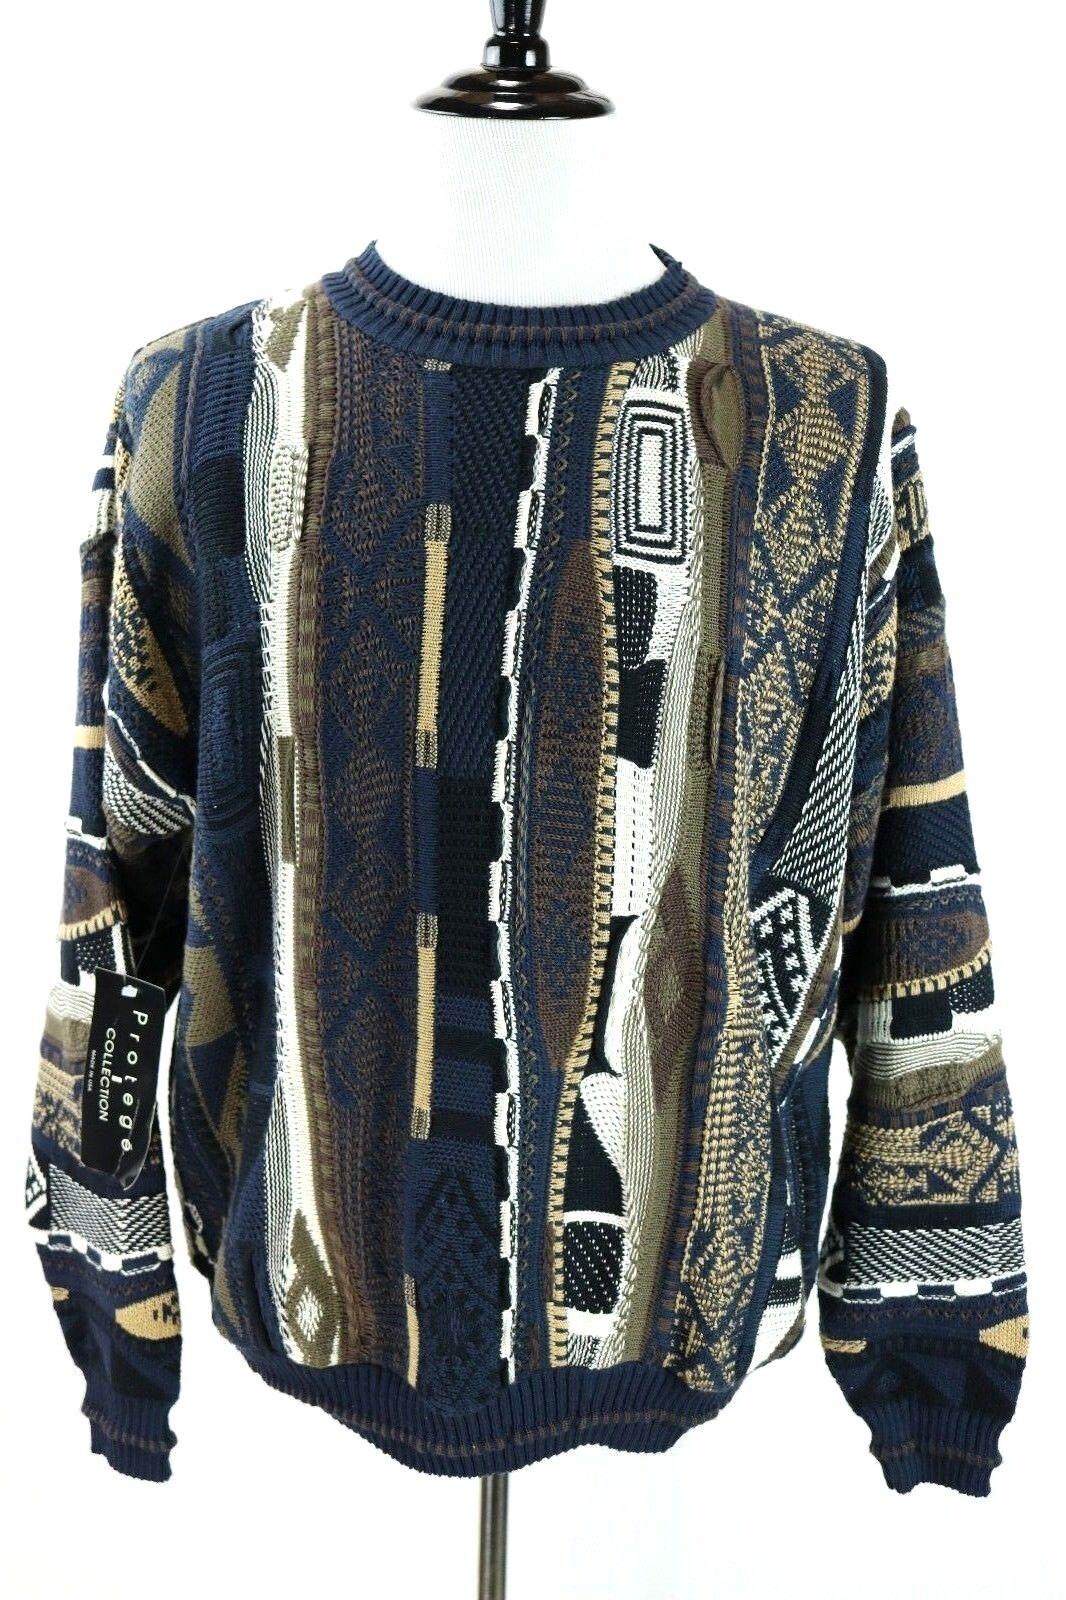 Taggio NWT Predege Textured Cosby Biggie Hip Hop 3D Sweater USA Acrylic Mens 2XL